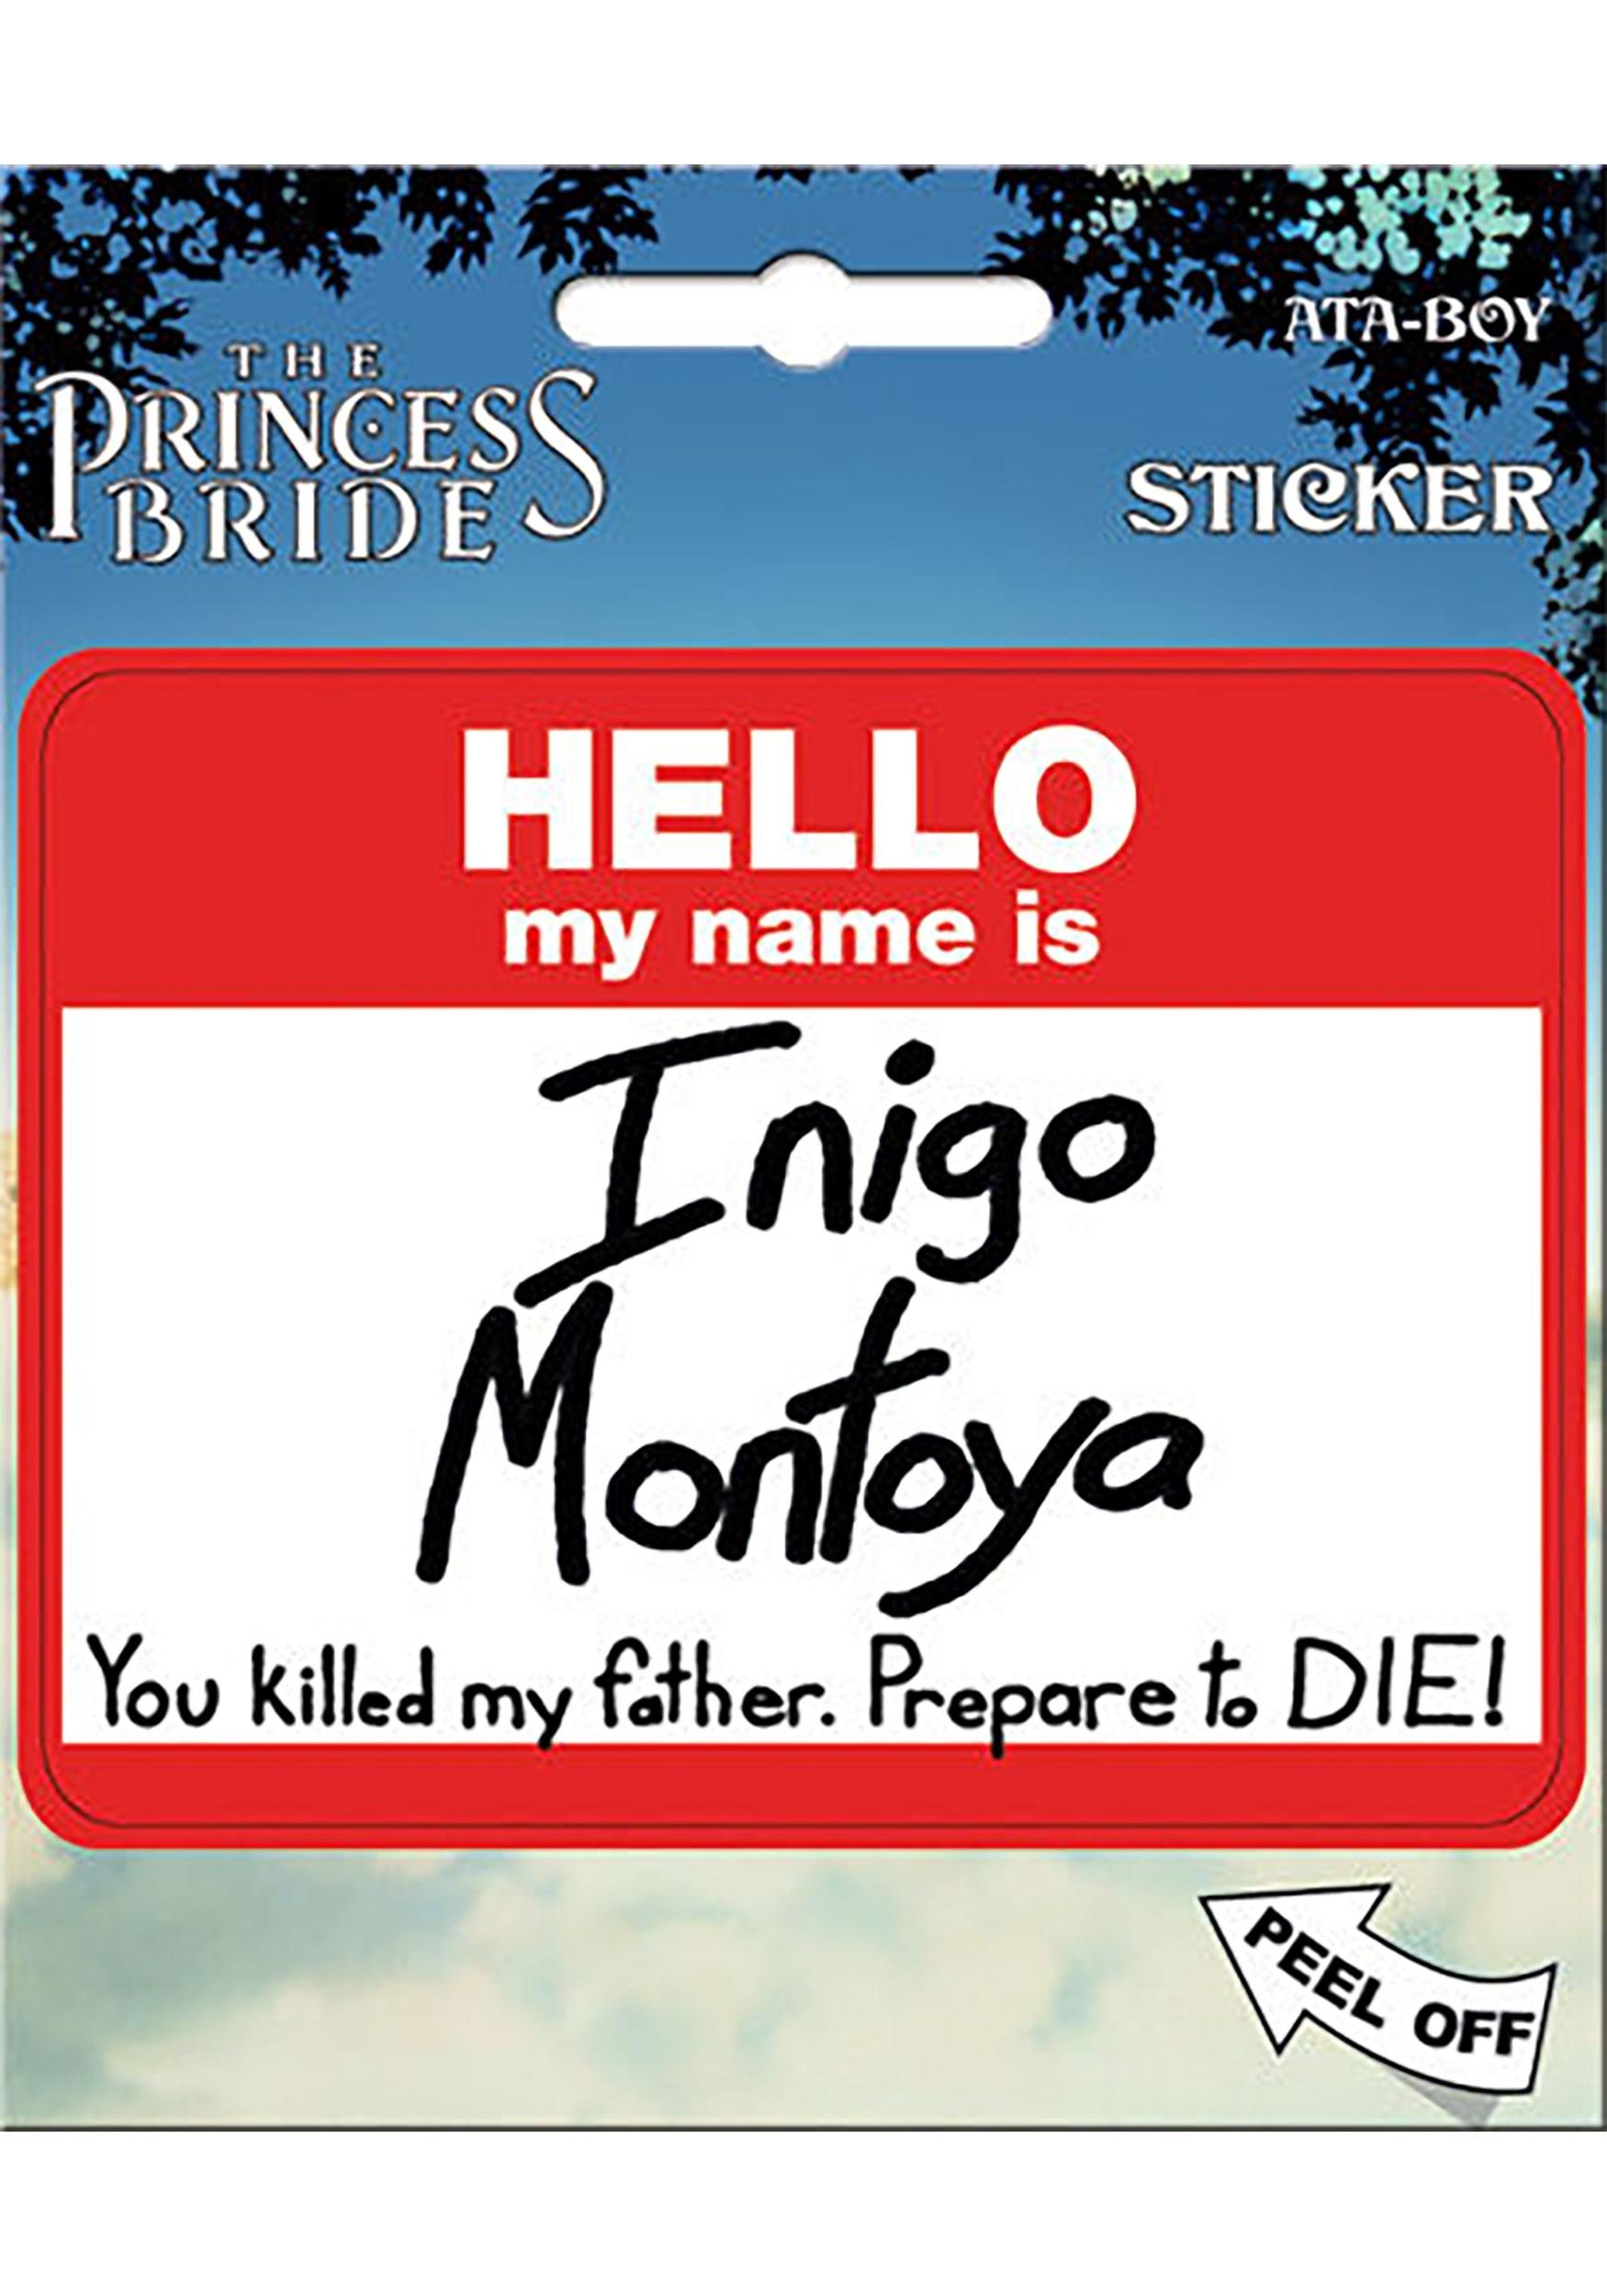 The_Princess_Bride_Hello_My_Name_is_Inigo_Sticker